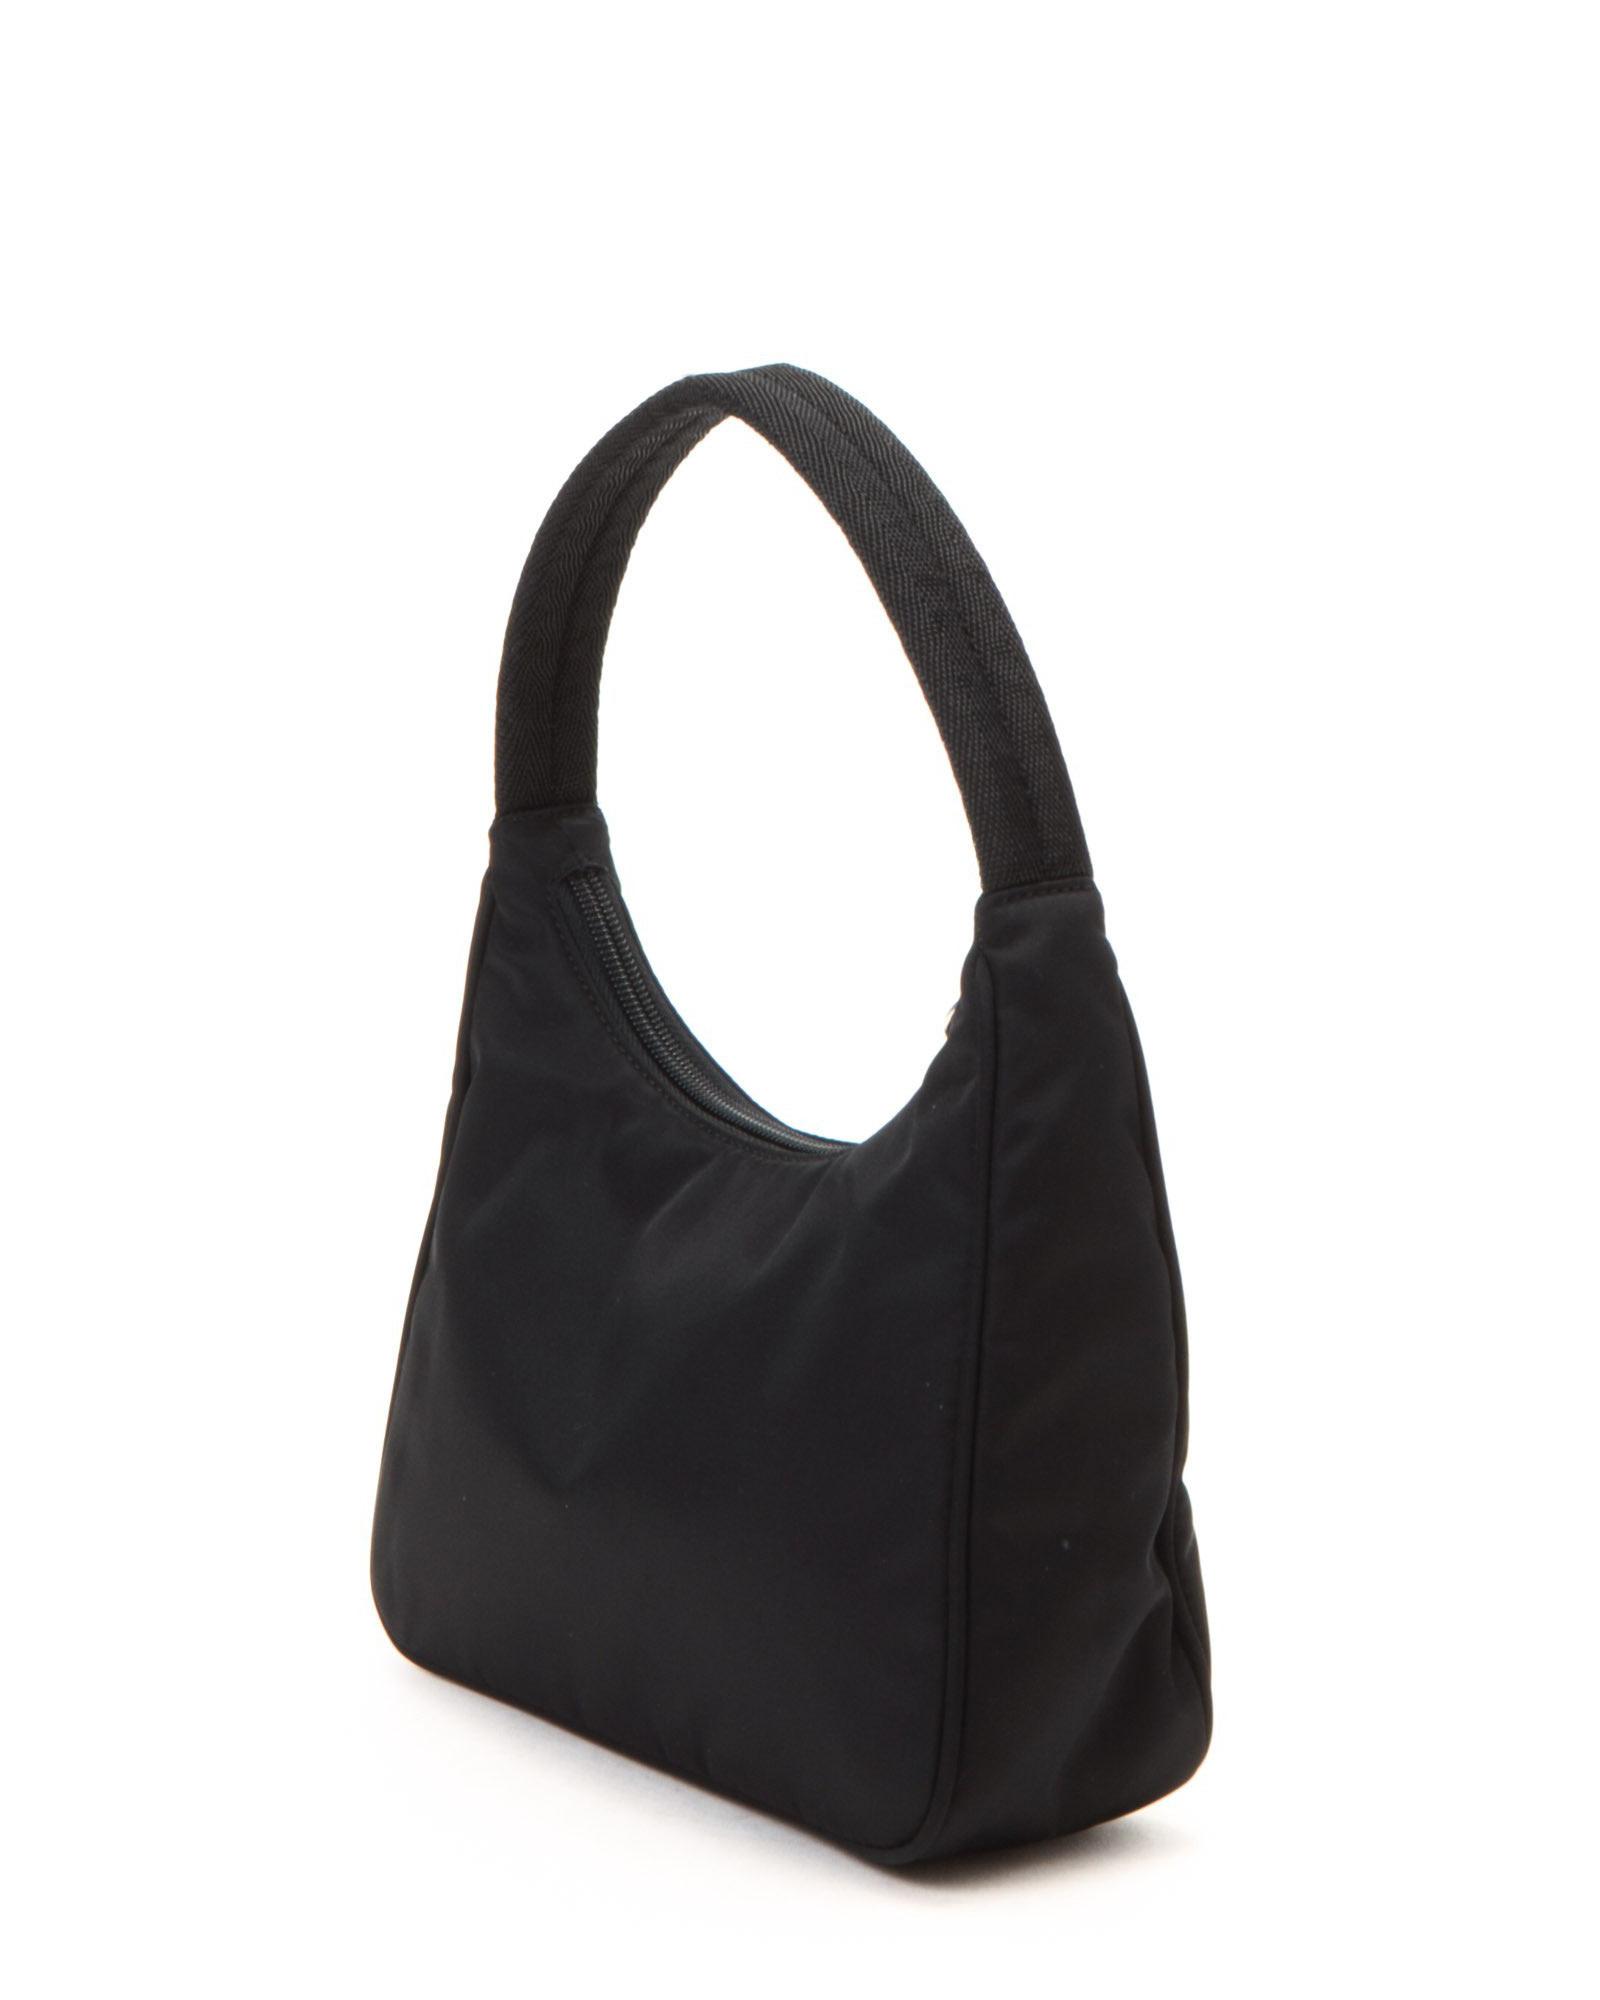 Prada Black Handbag - Vintage in Black | Lyst